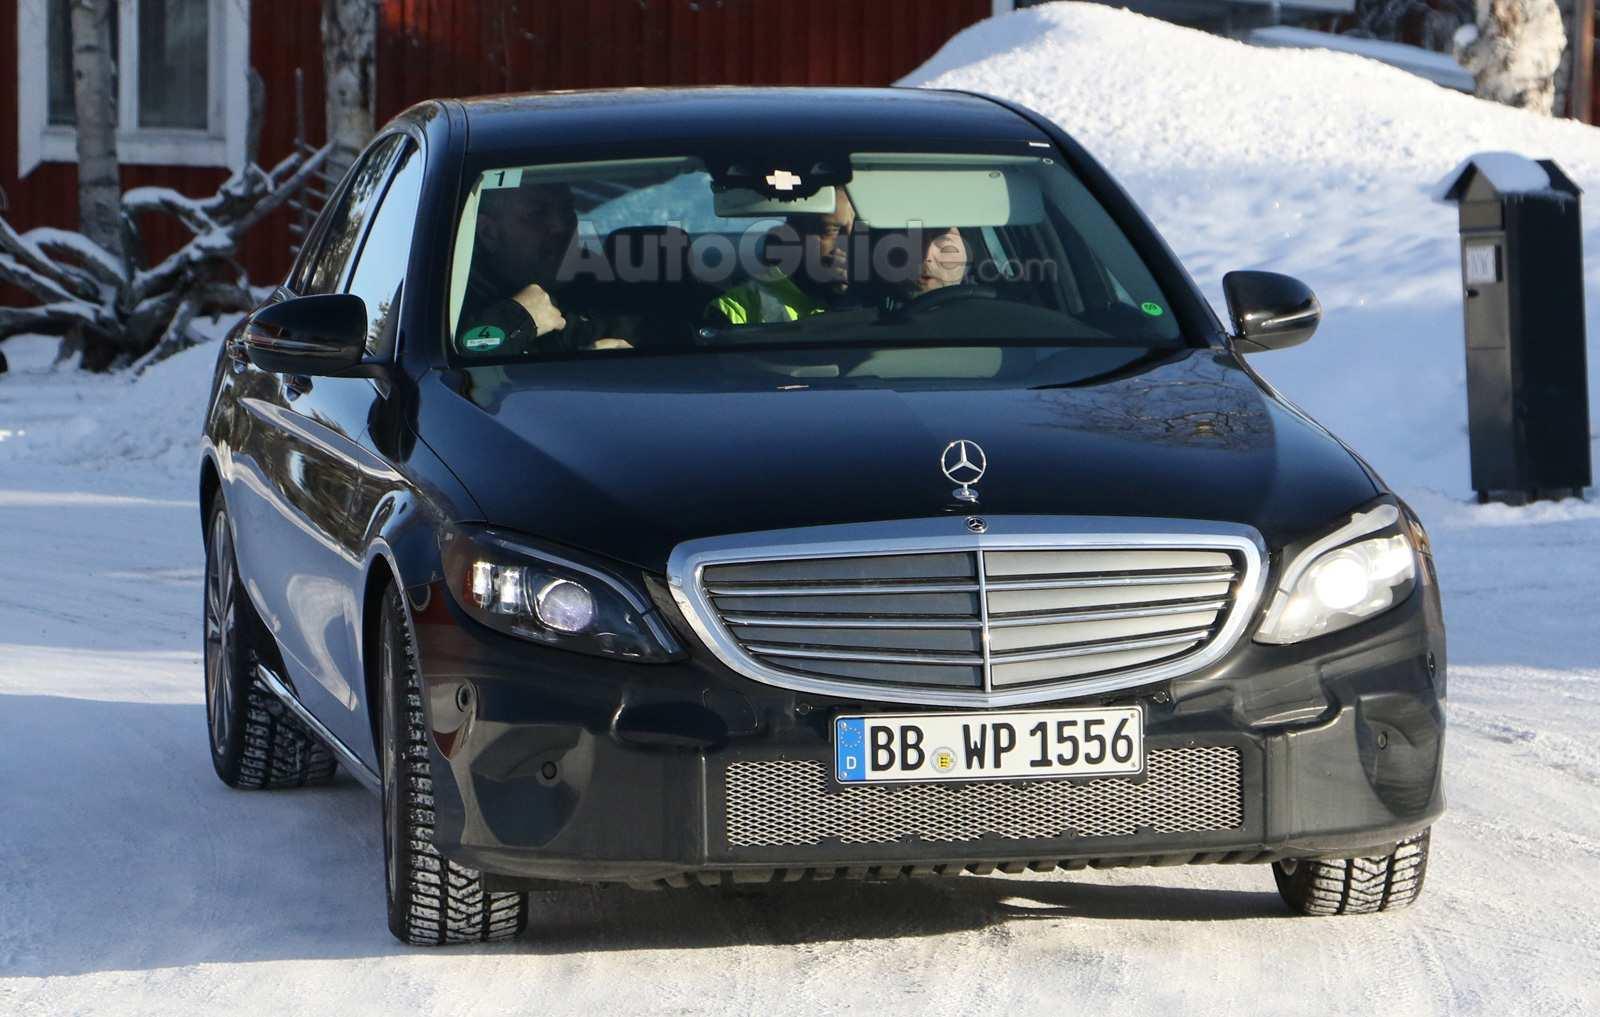 67 Gallery of Mercedes Benz C Class Facelift 2019 Performance and New Engine with Mercedes Benz C Class Facelift 2019